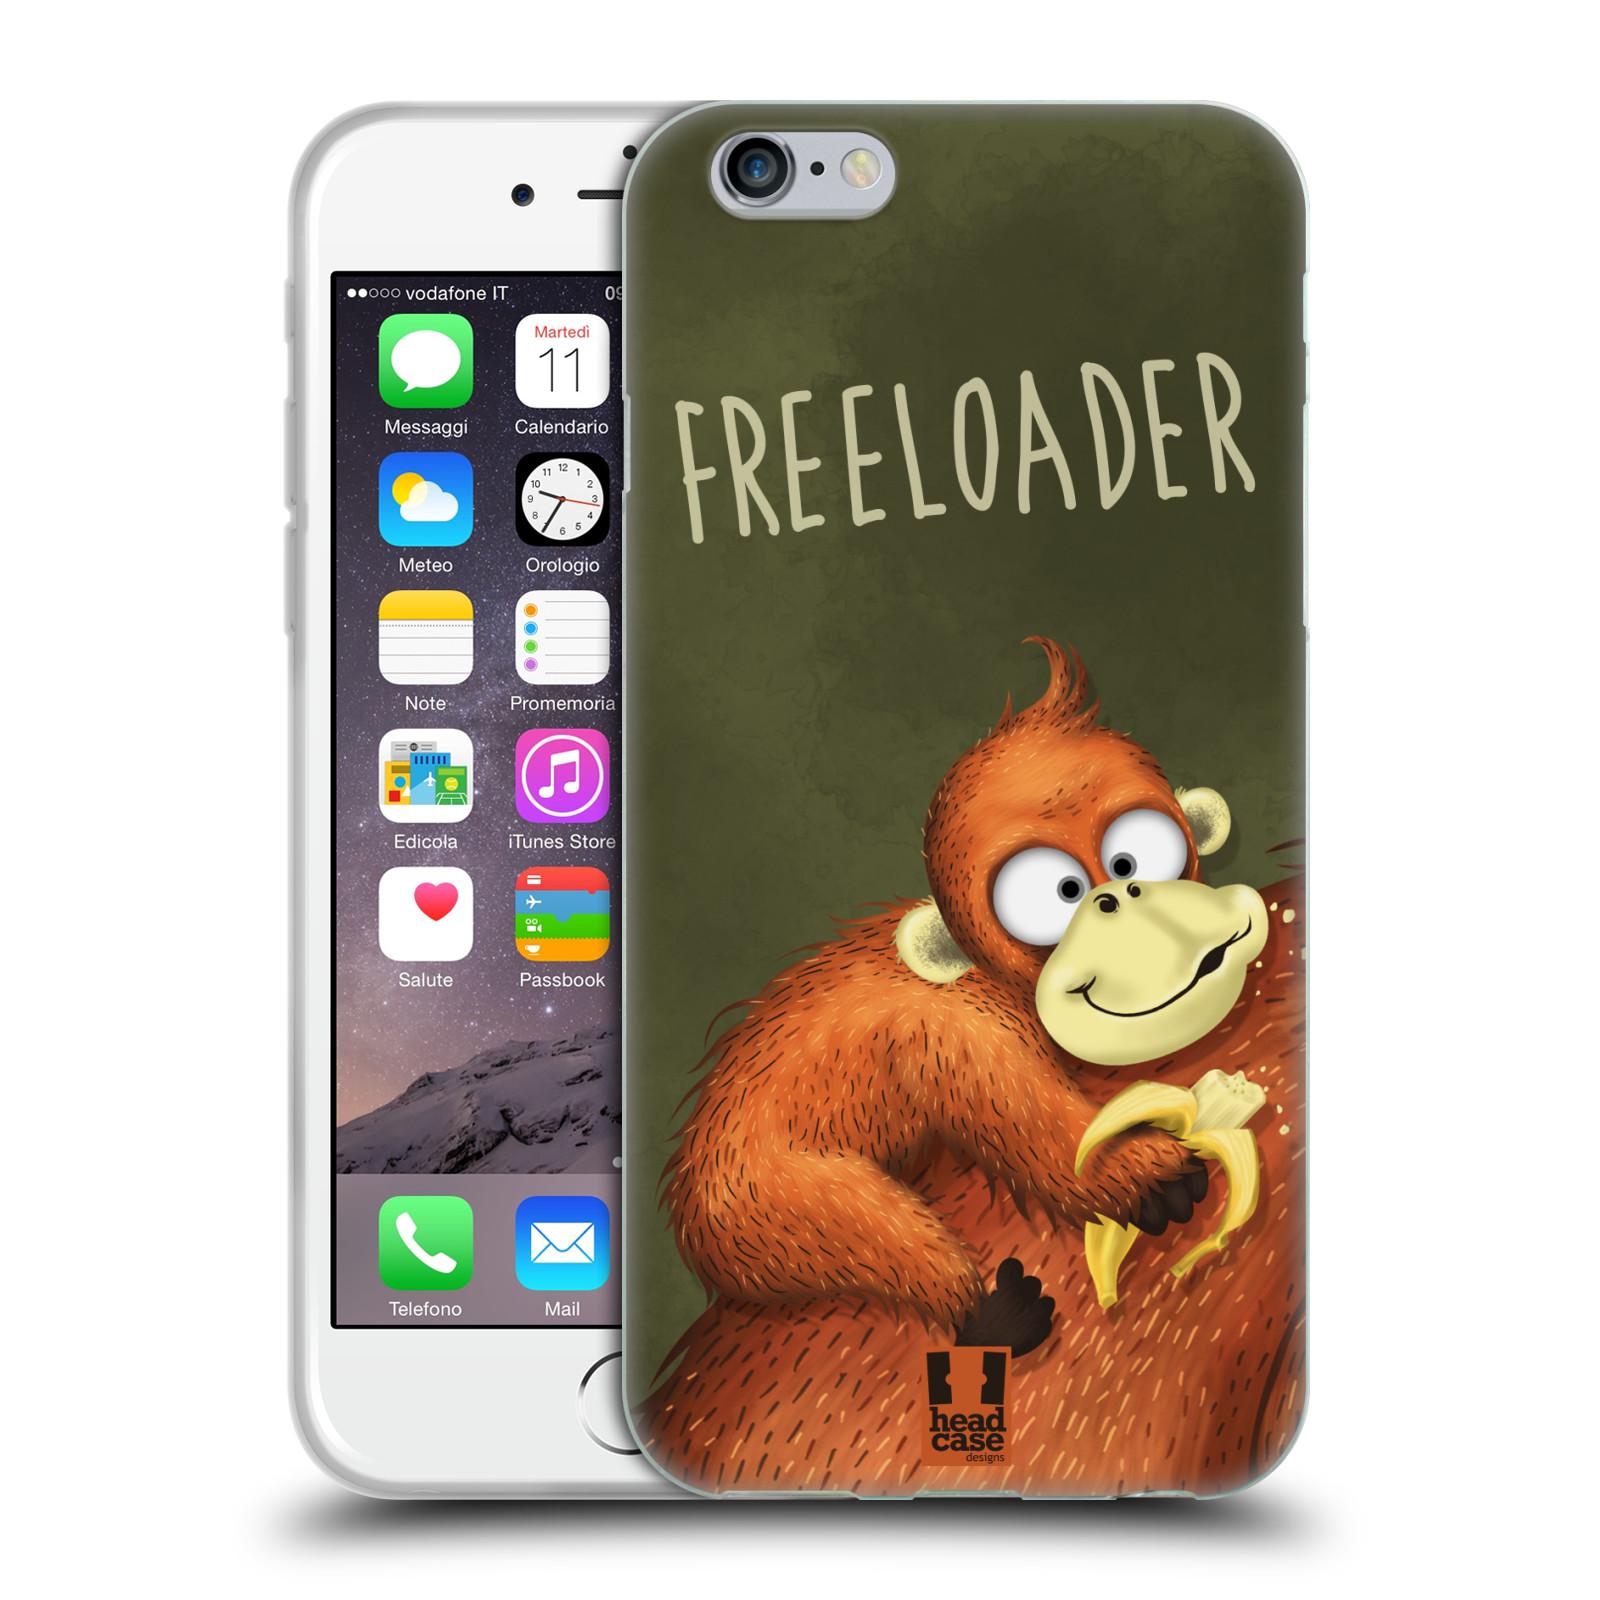 Silikonové pouzdro na mobil Apple iPhone 6 HEAD CASE Opičák Freeloader